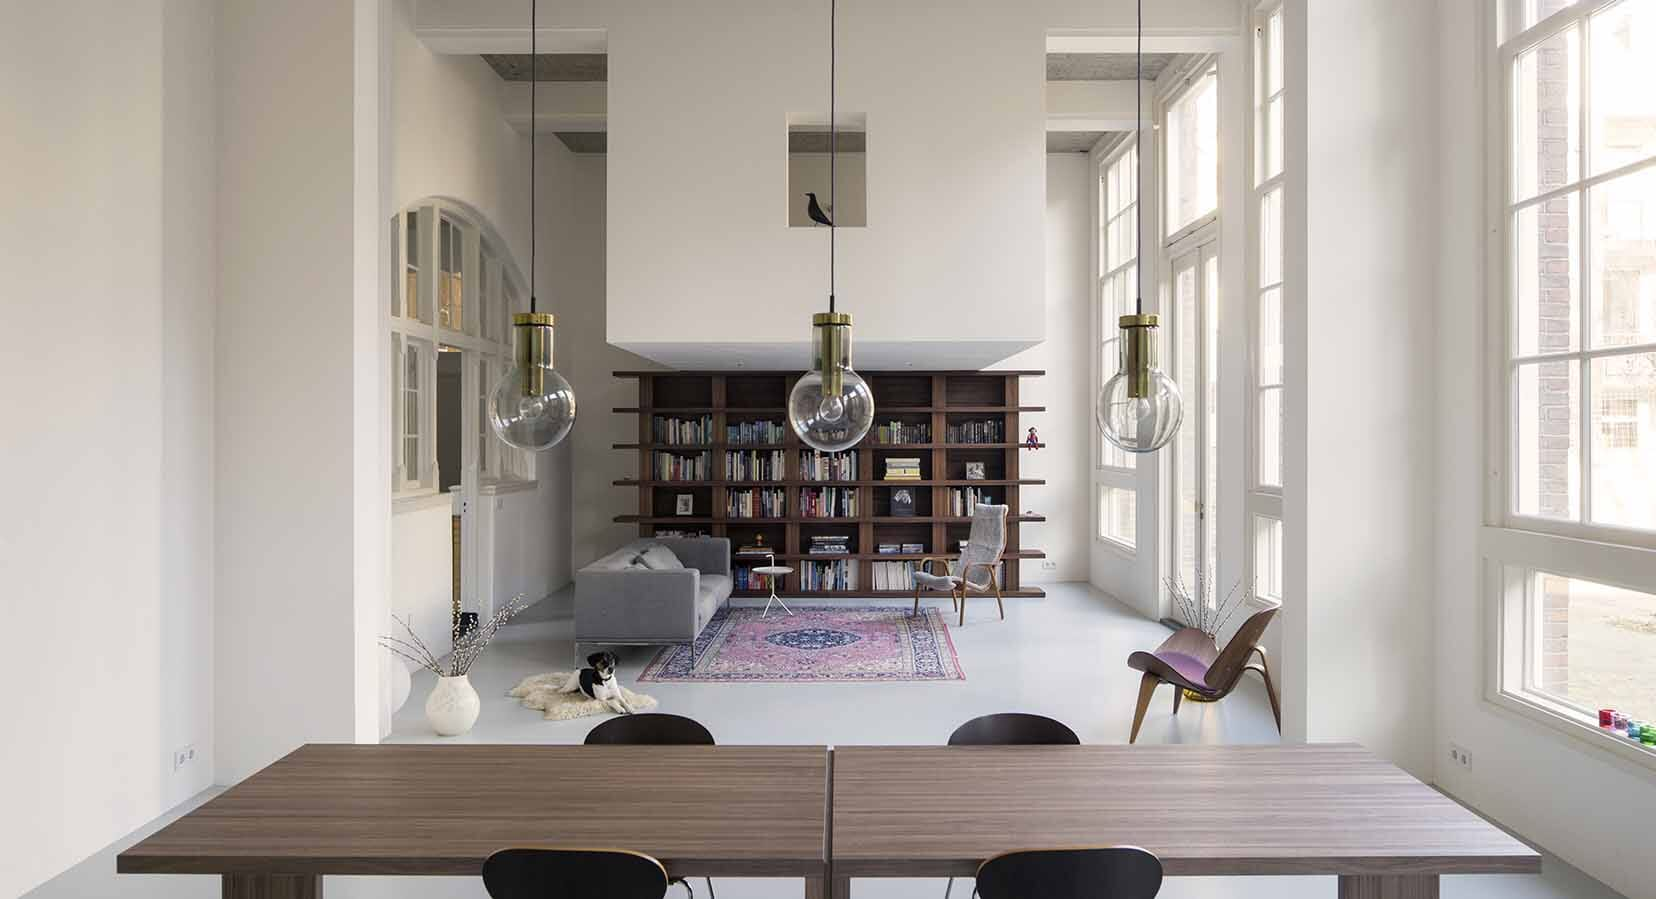 Eklund Terbeek Transform 20th Century Schoolhouse